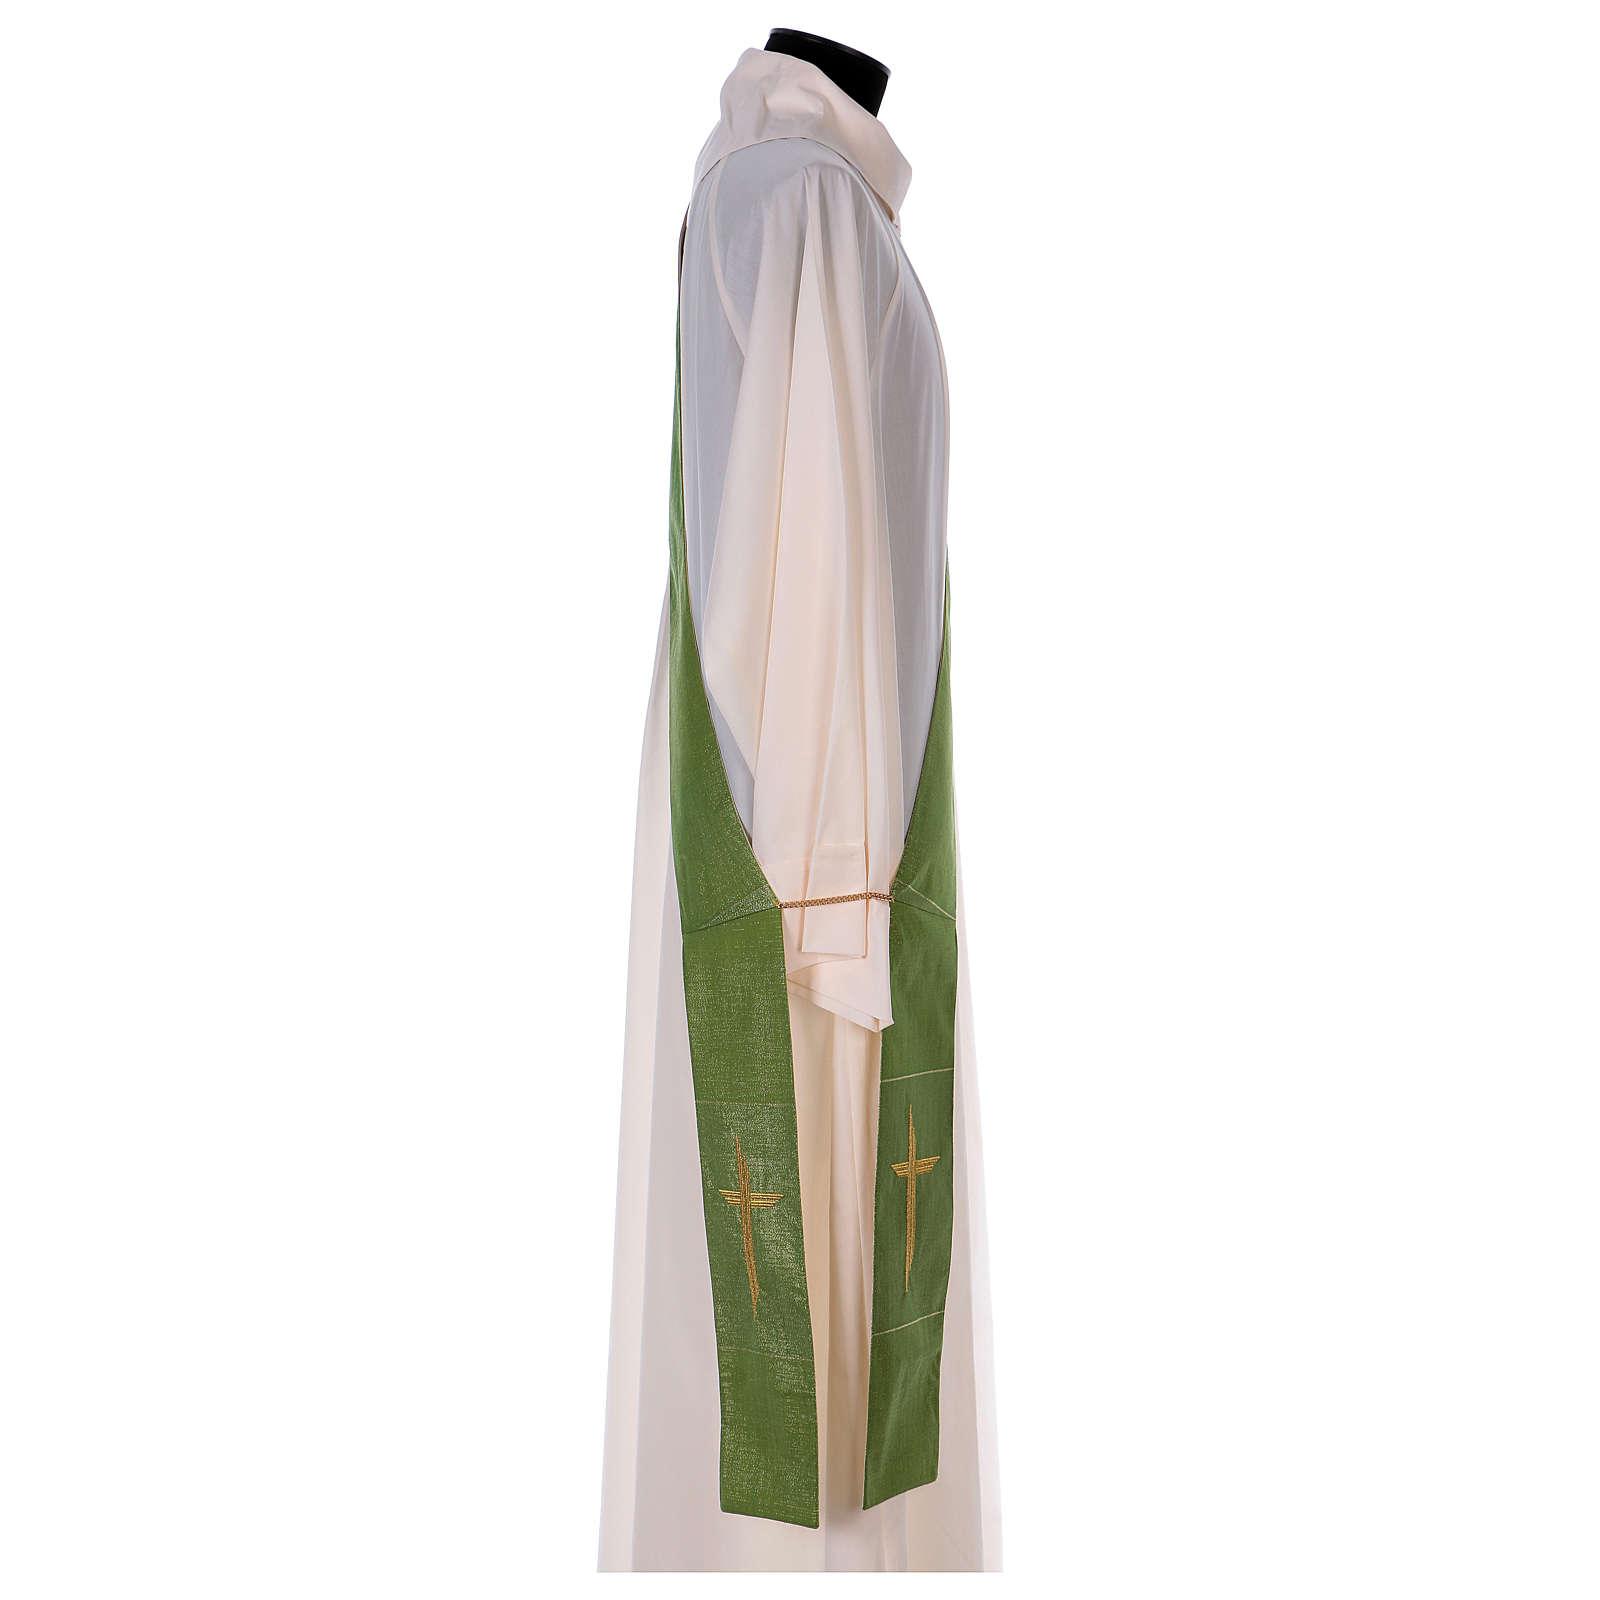 Stola reversibile 85% lana 15% lurex con croce 4